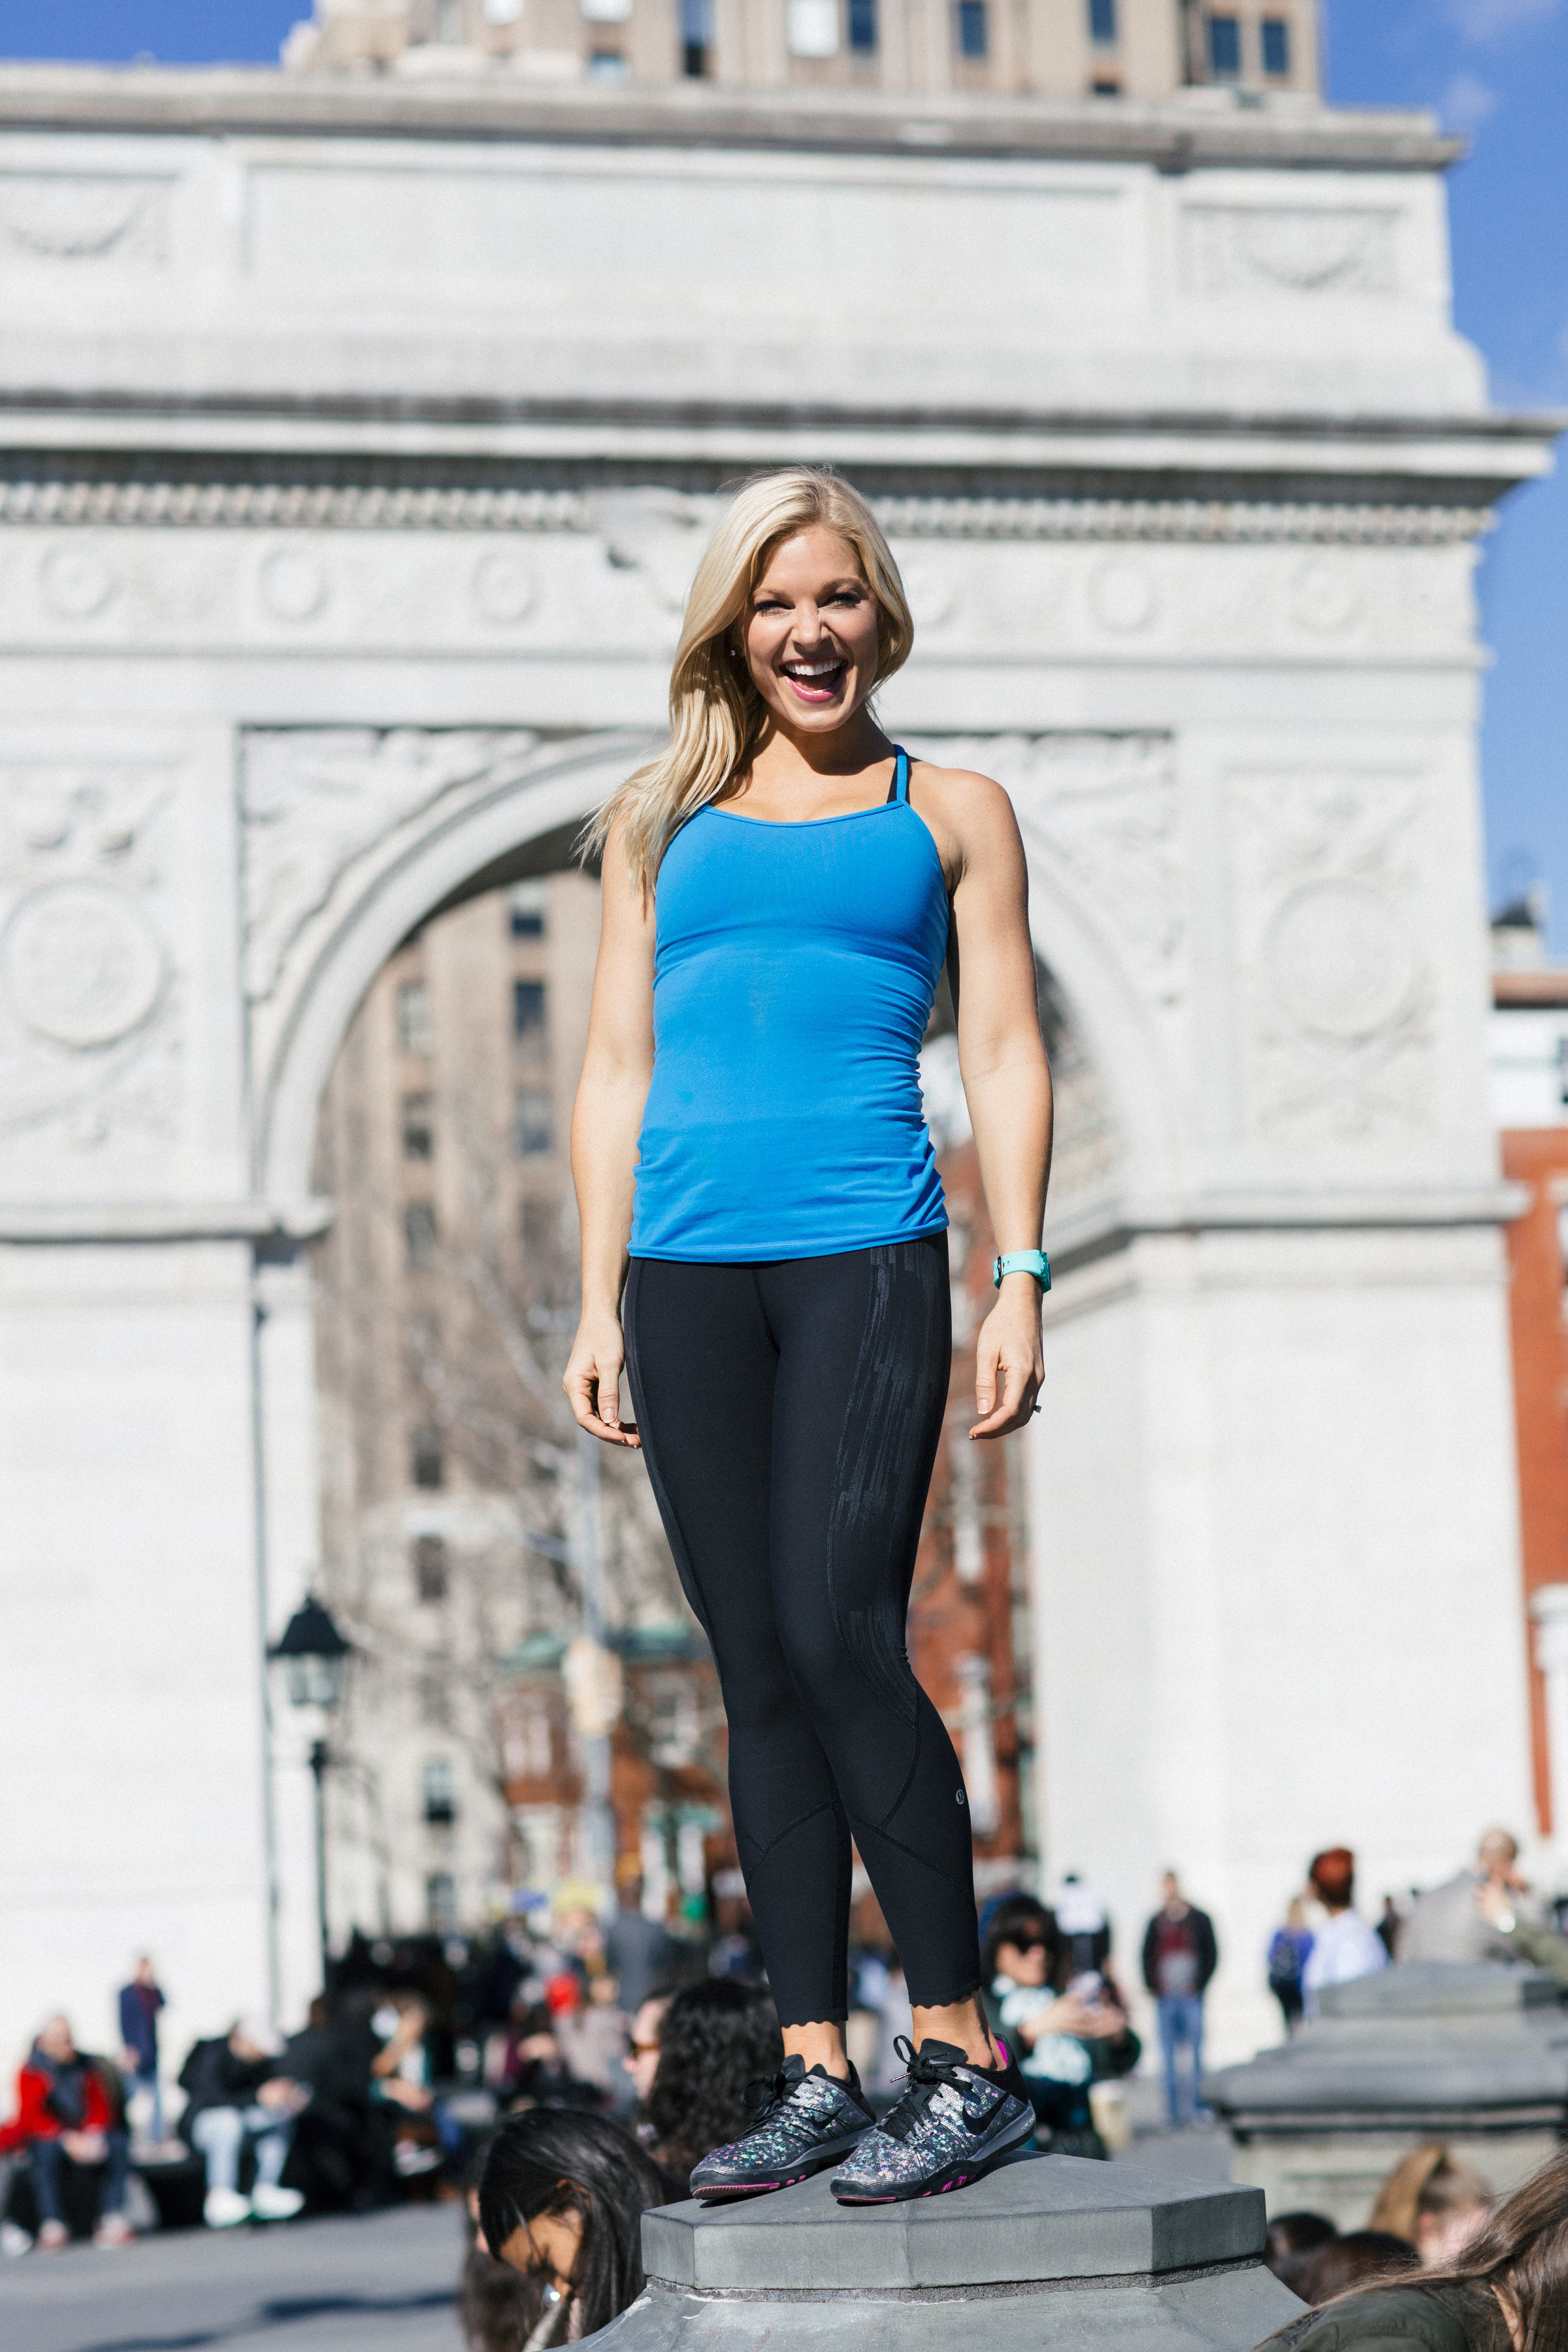 Anna Kooiman New York City Fitness Washington Square Park Standing on Fountain Lydia Hudgens